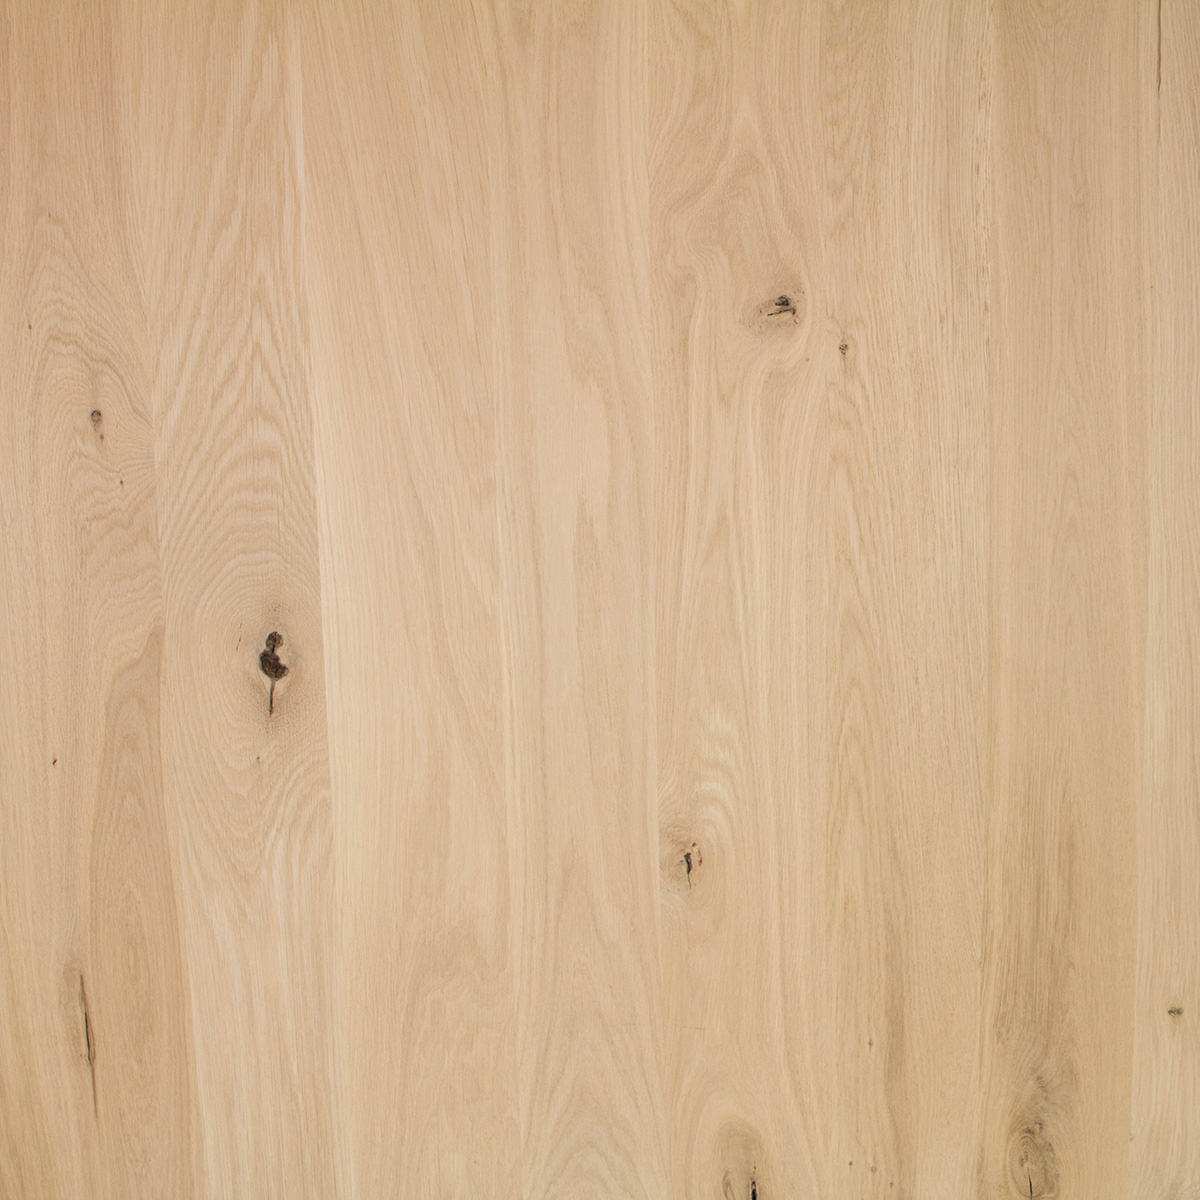 Eiken salontafel X-poten (SET - 2 stuks) 8x10cm - 65 cm breed -  Salontafel kruispoot / X-poot van Rustiek eikenhout - verlijmd kd 8-12%